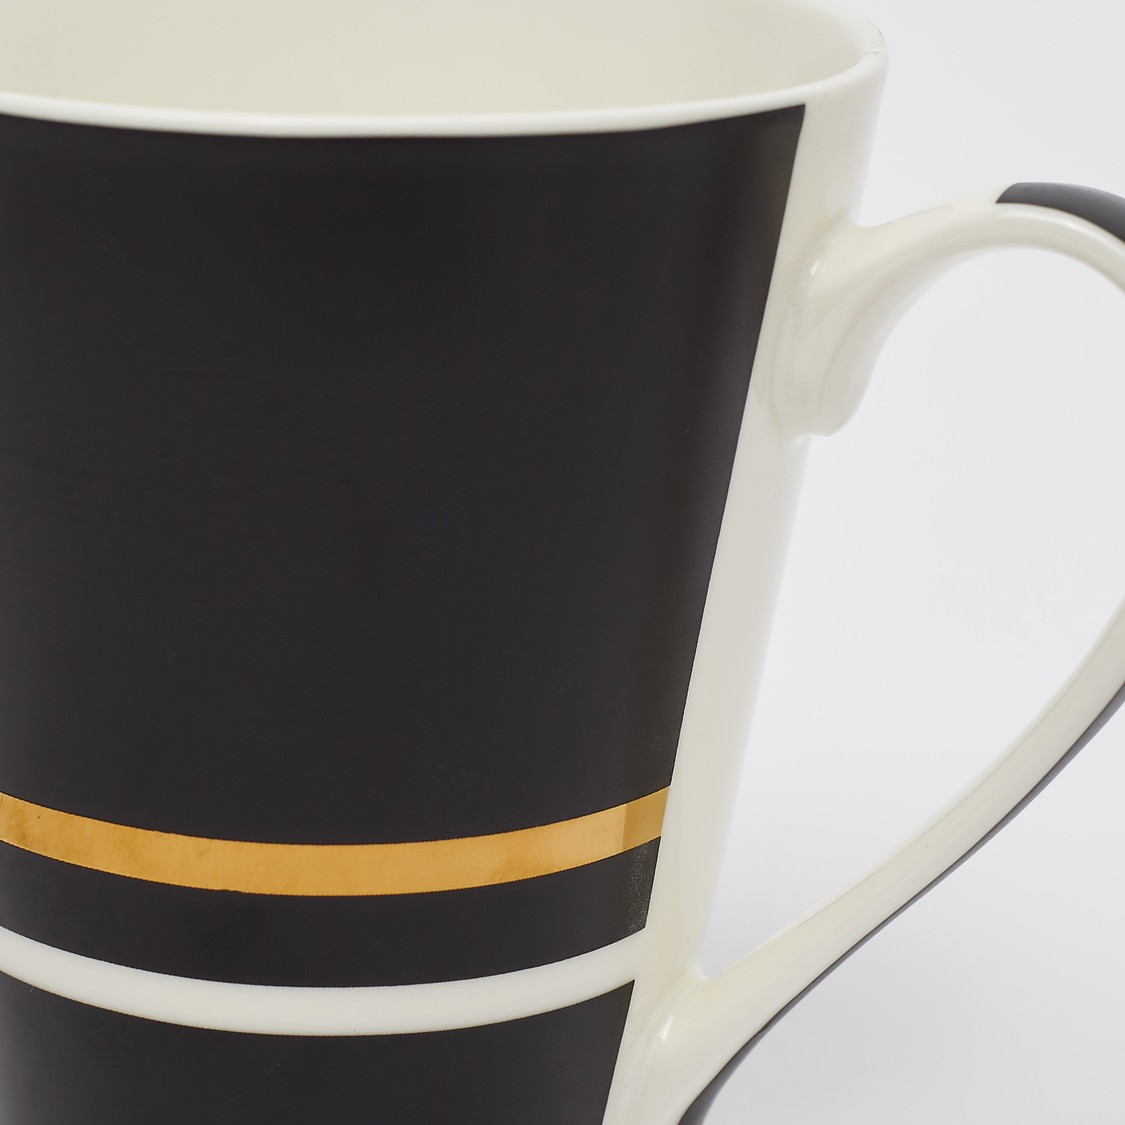 Printed Mug with Curved Handle - 11x6x9 cms